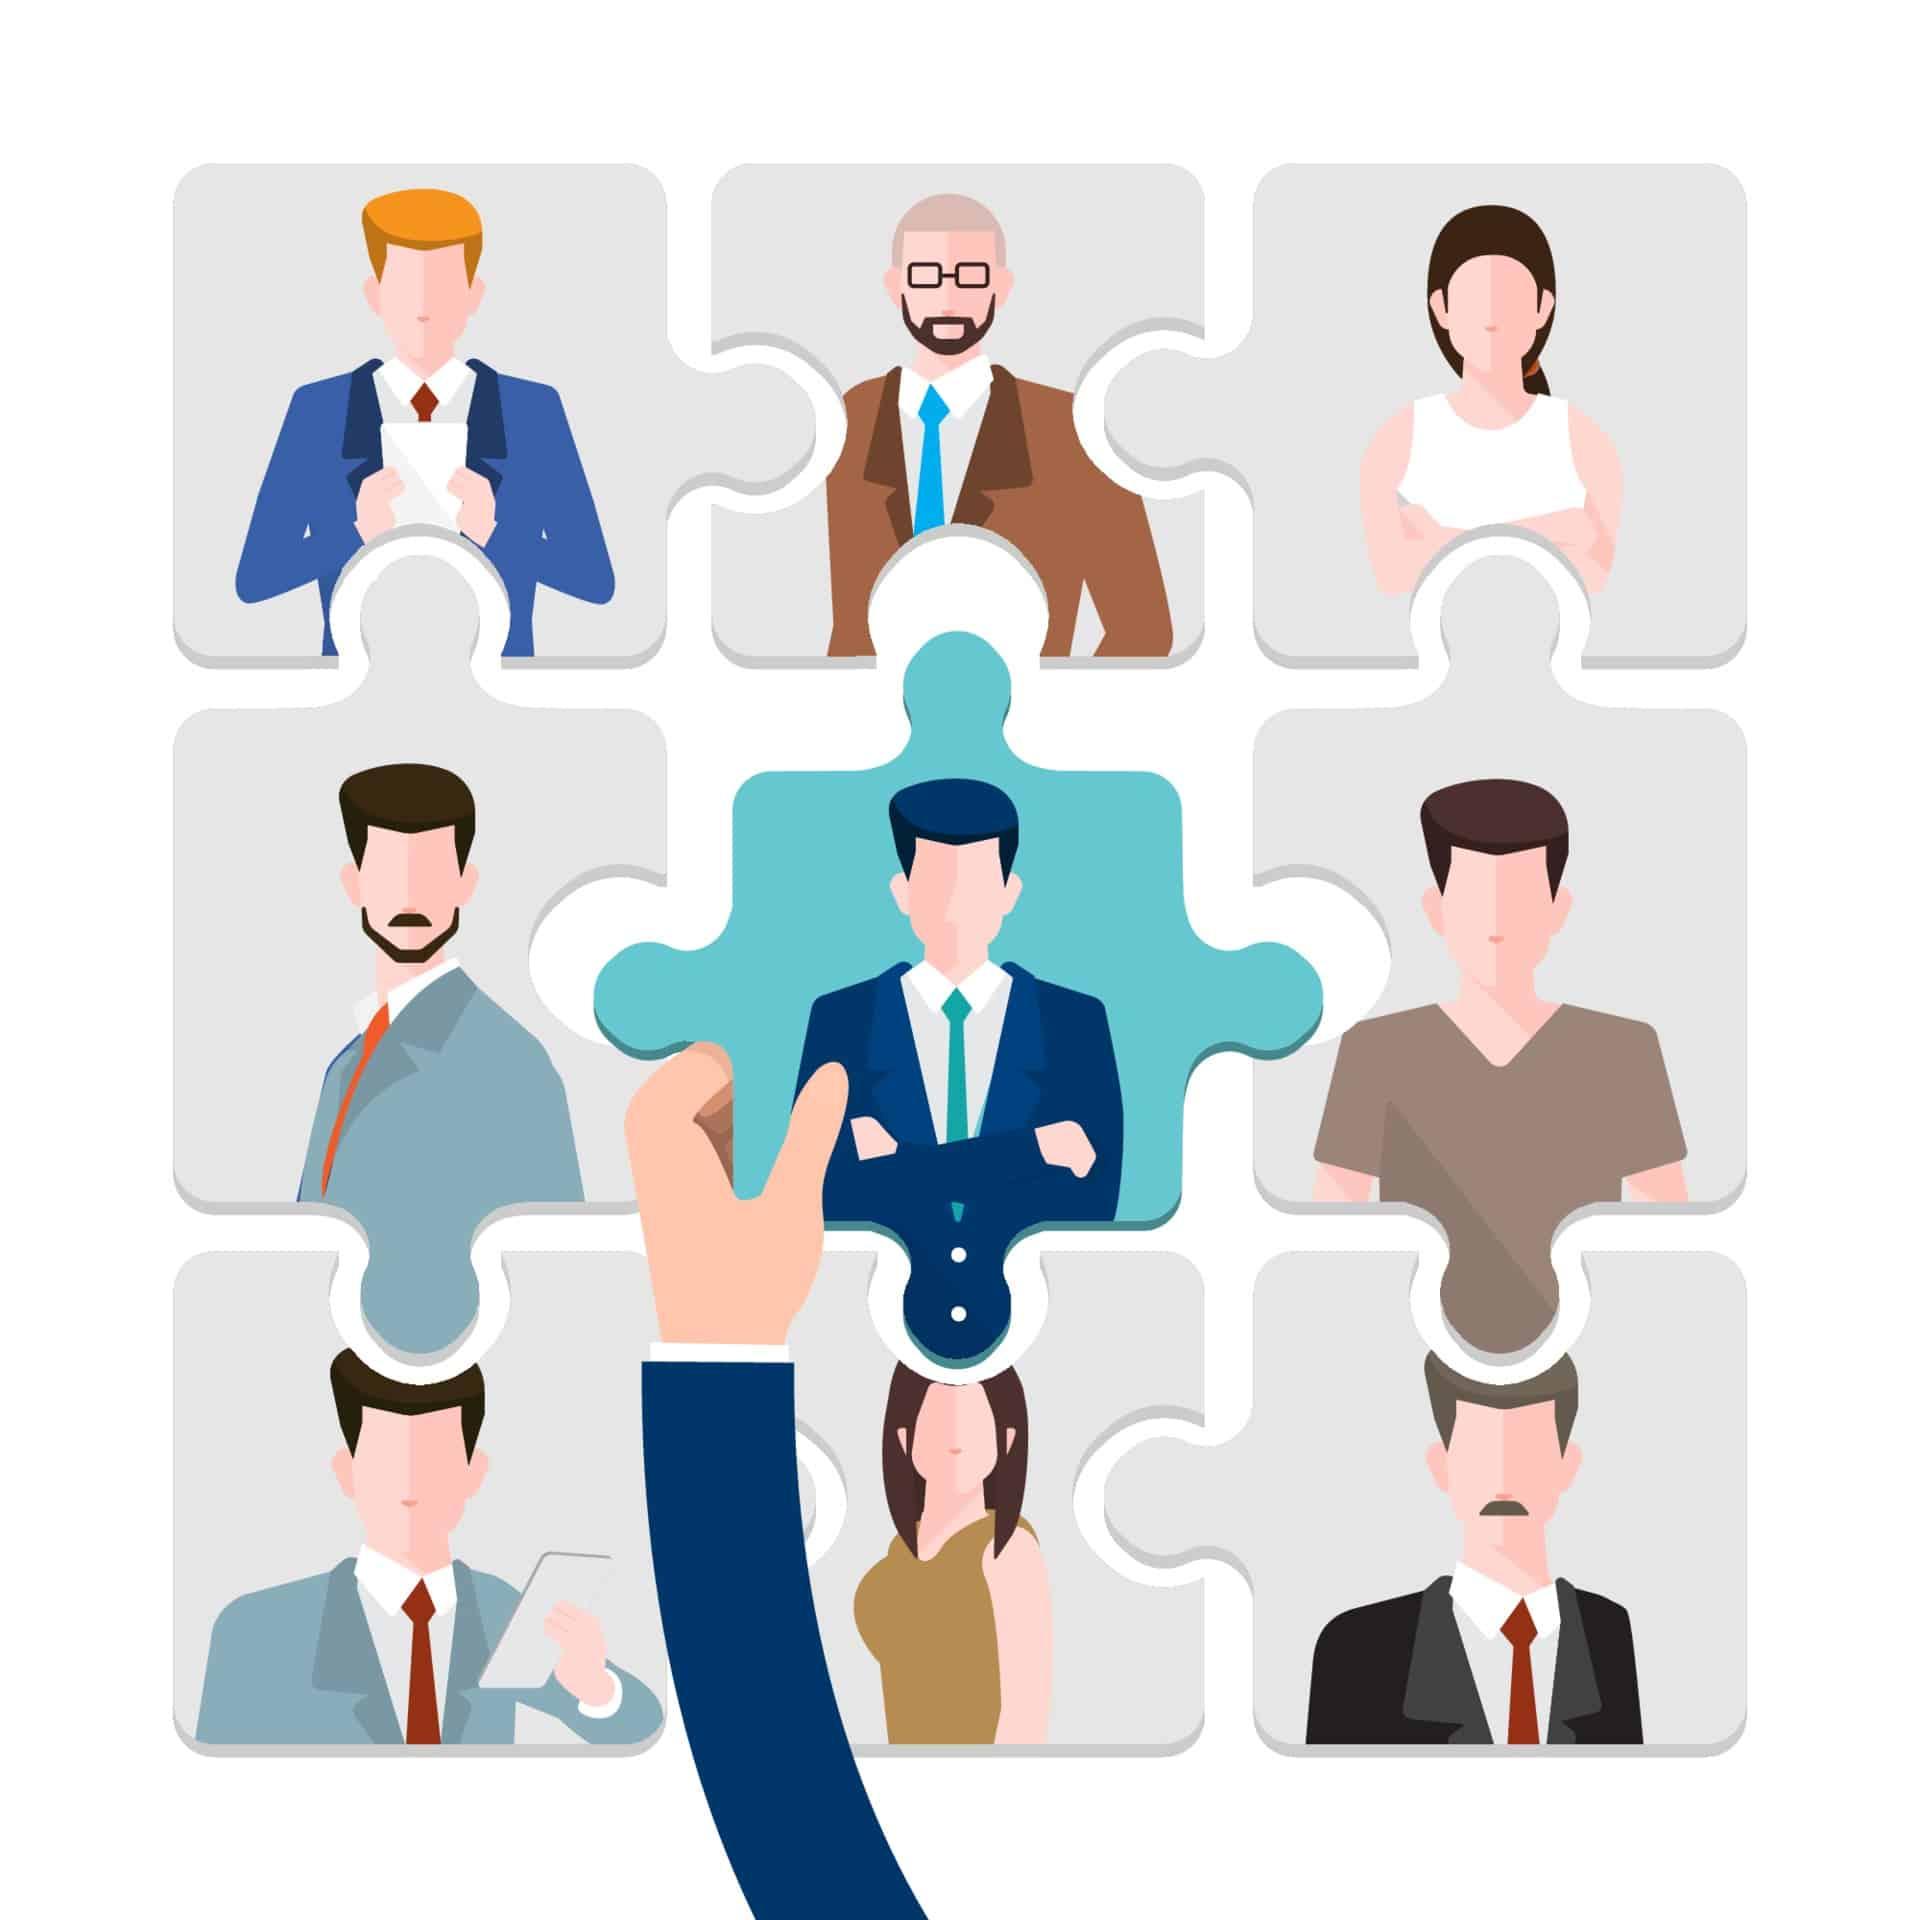 HR_Job_Seeking_06__Converted__generated